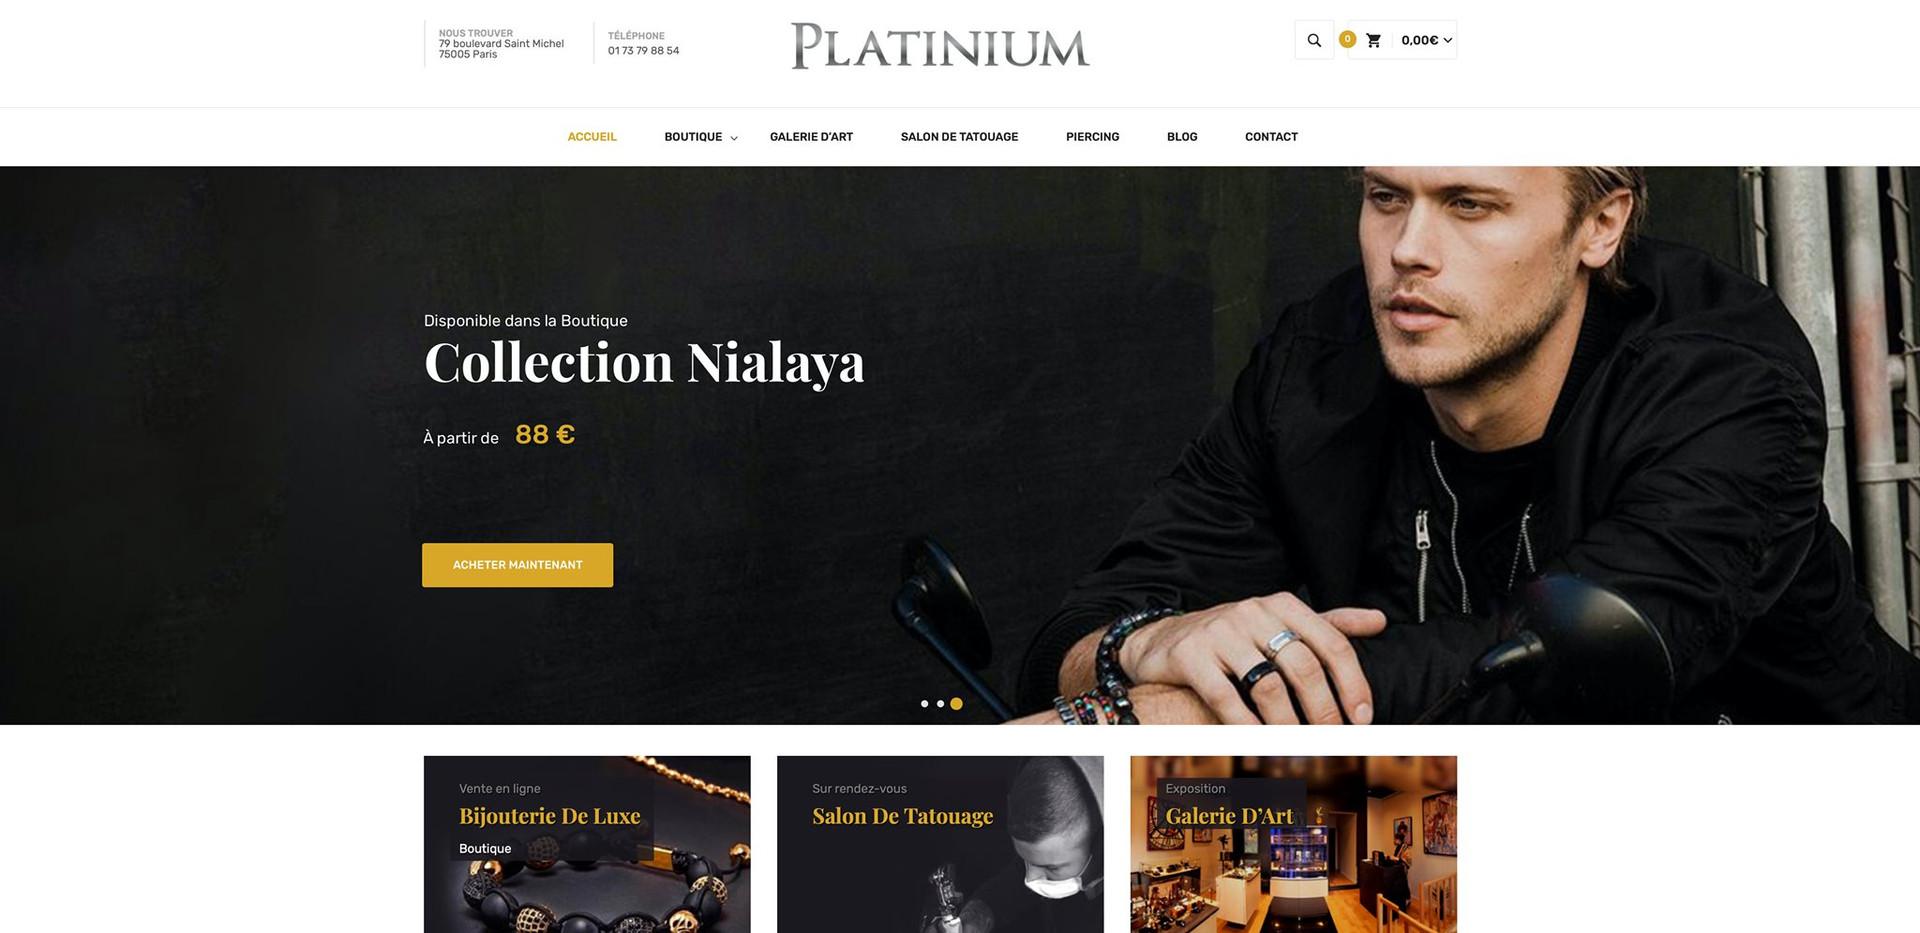 Platinium2A.jpg